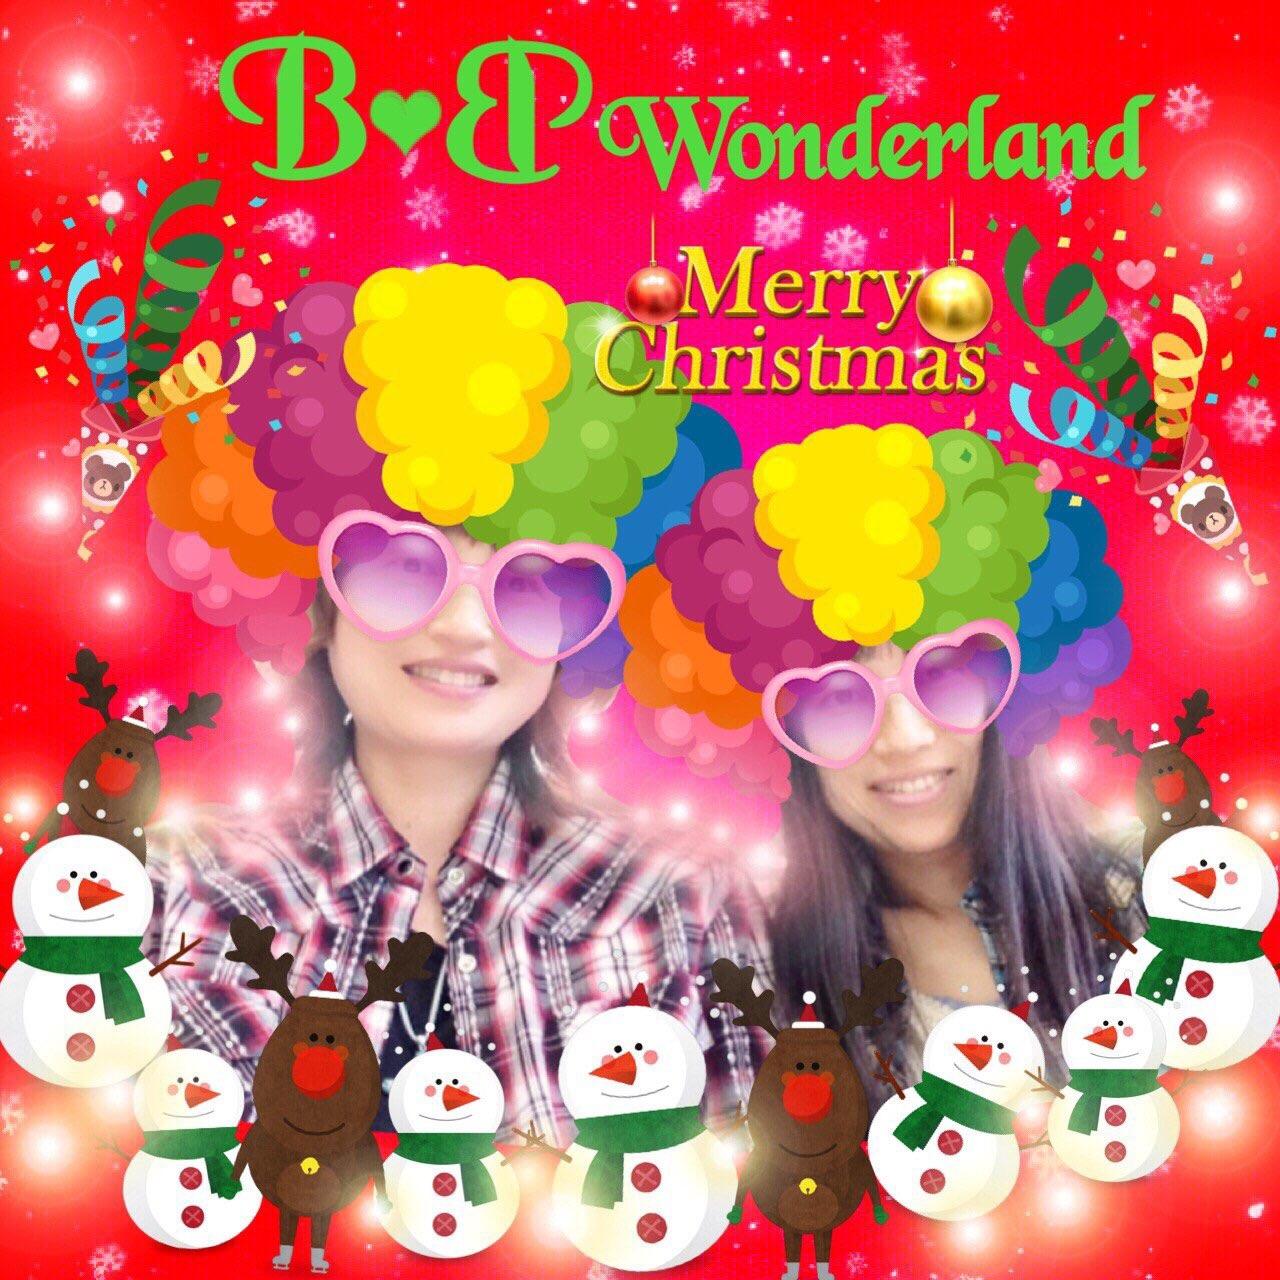 B.B Wonderland